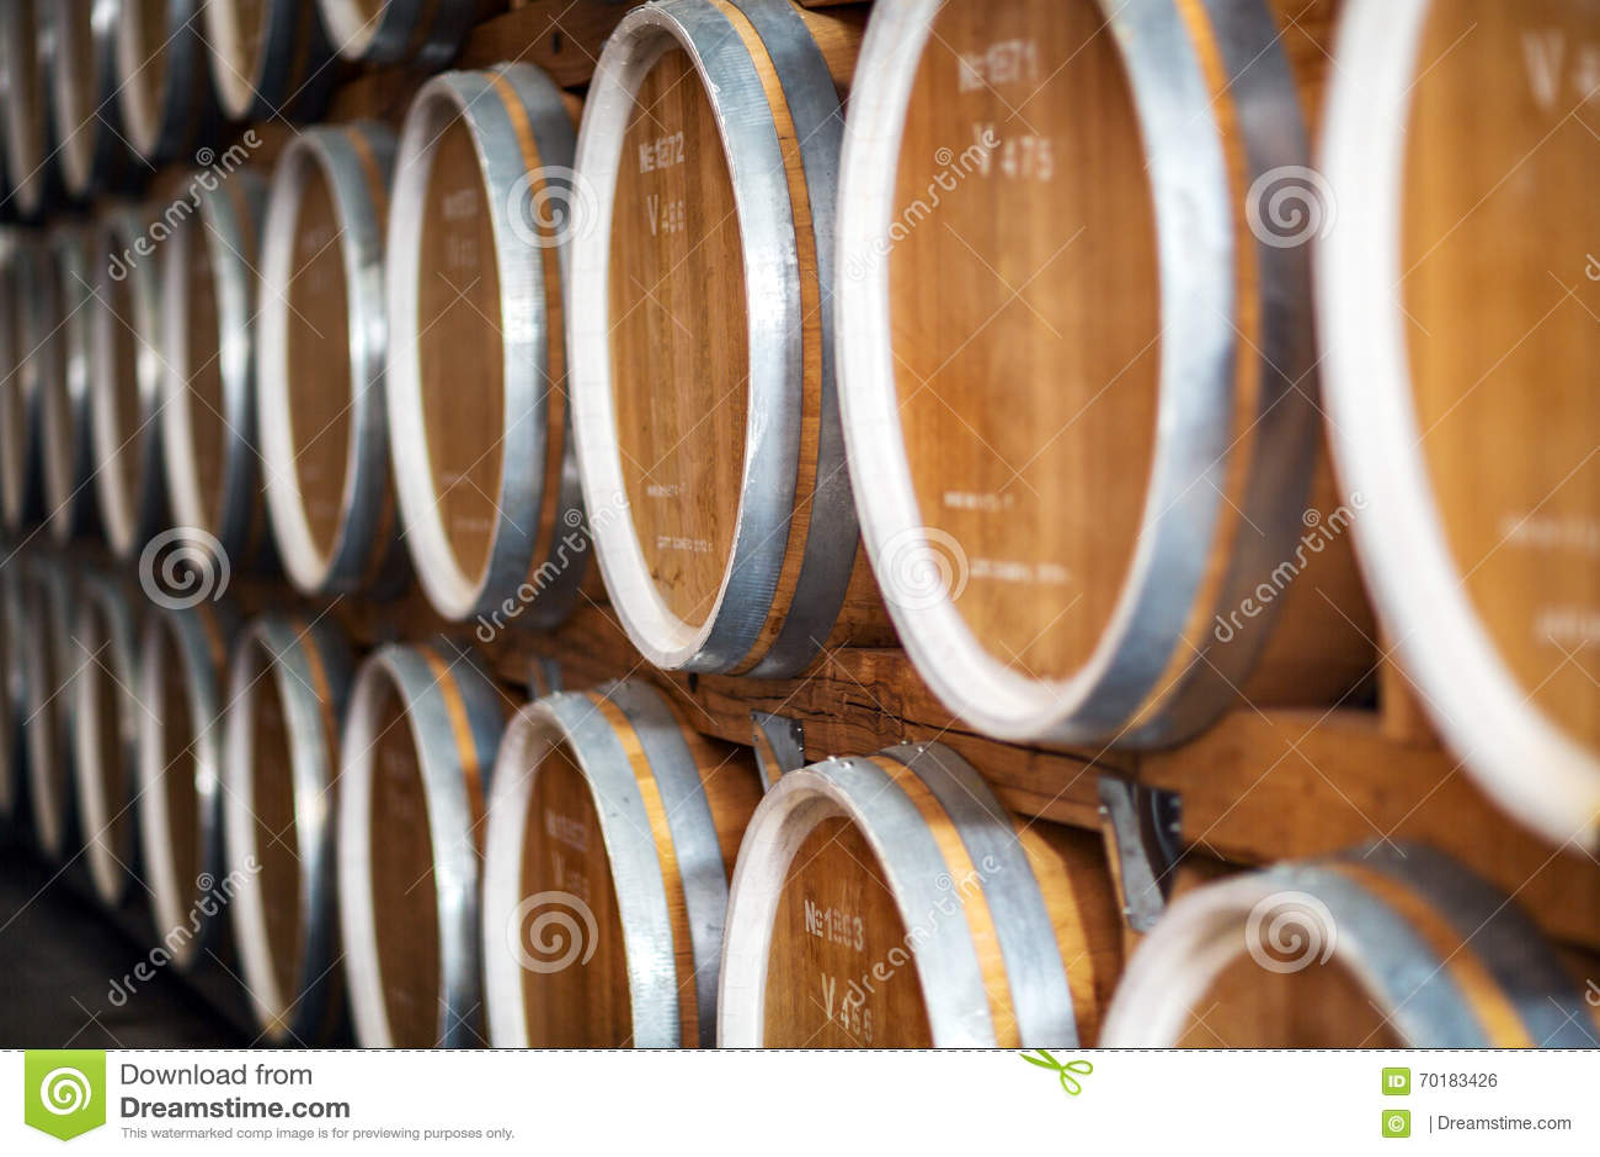 Rader av vinfat i valv på vinodlingen